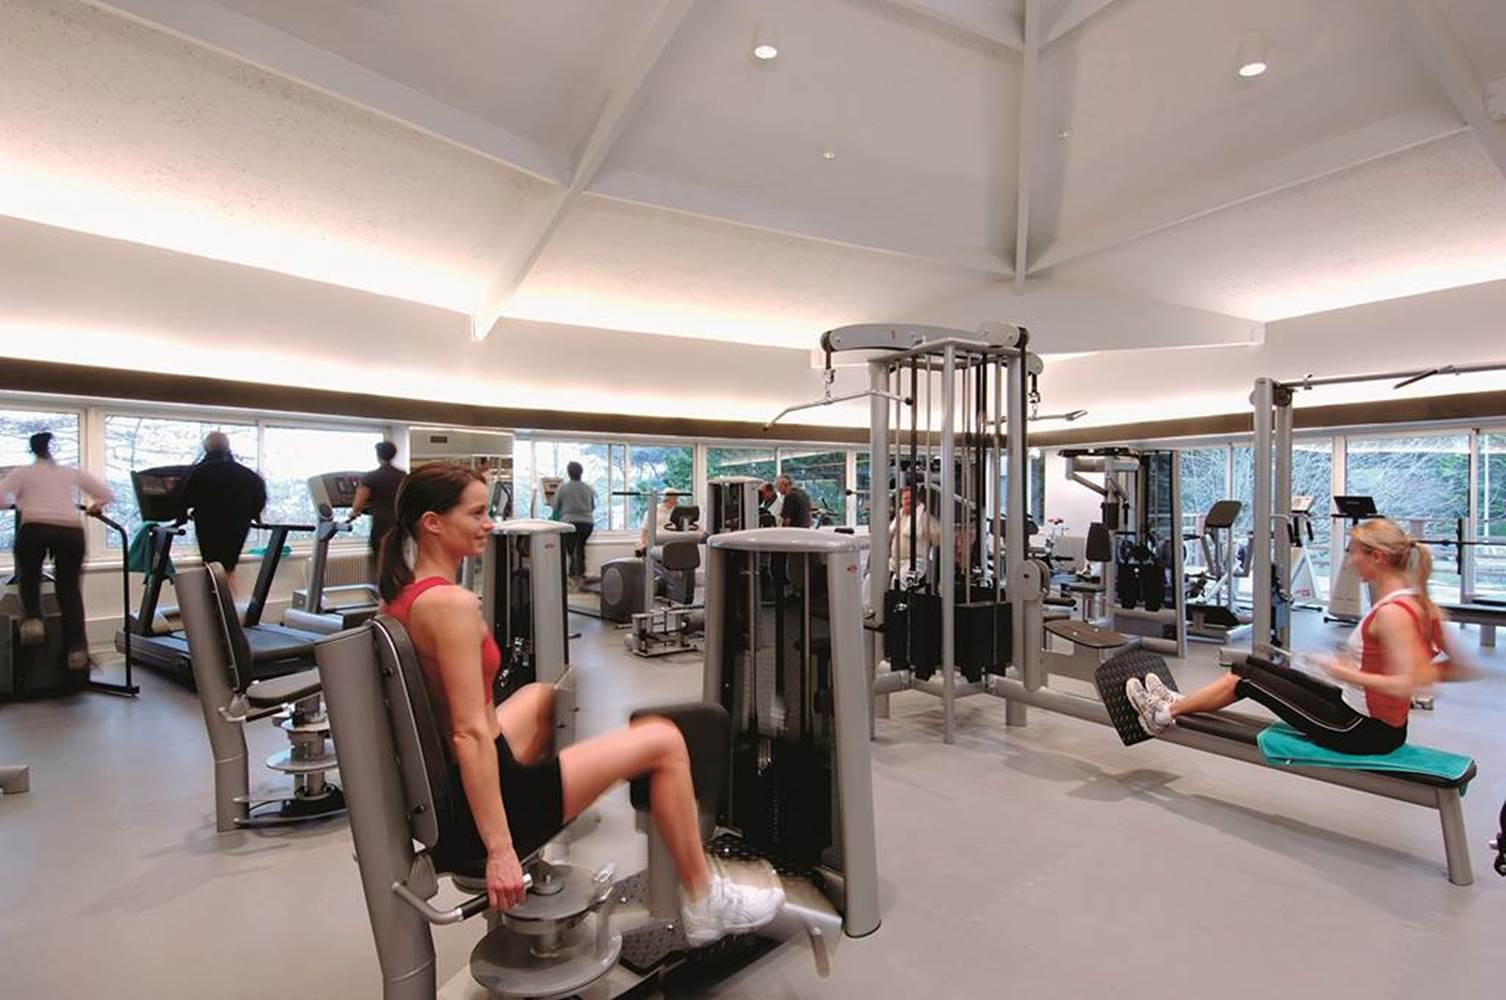 Thalazur-Carnac-Spa-Marin-Morbihan-Bretagne-Sud-Salle-fitness-et-forme ©